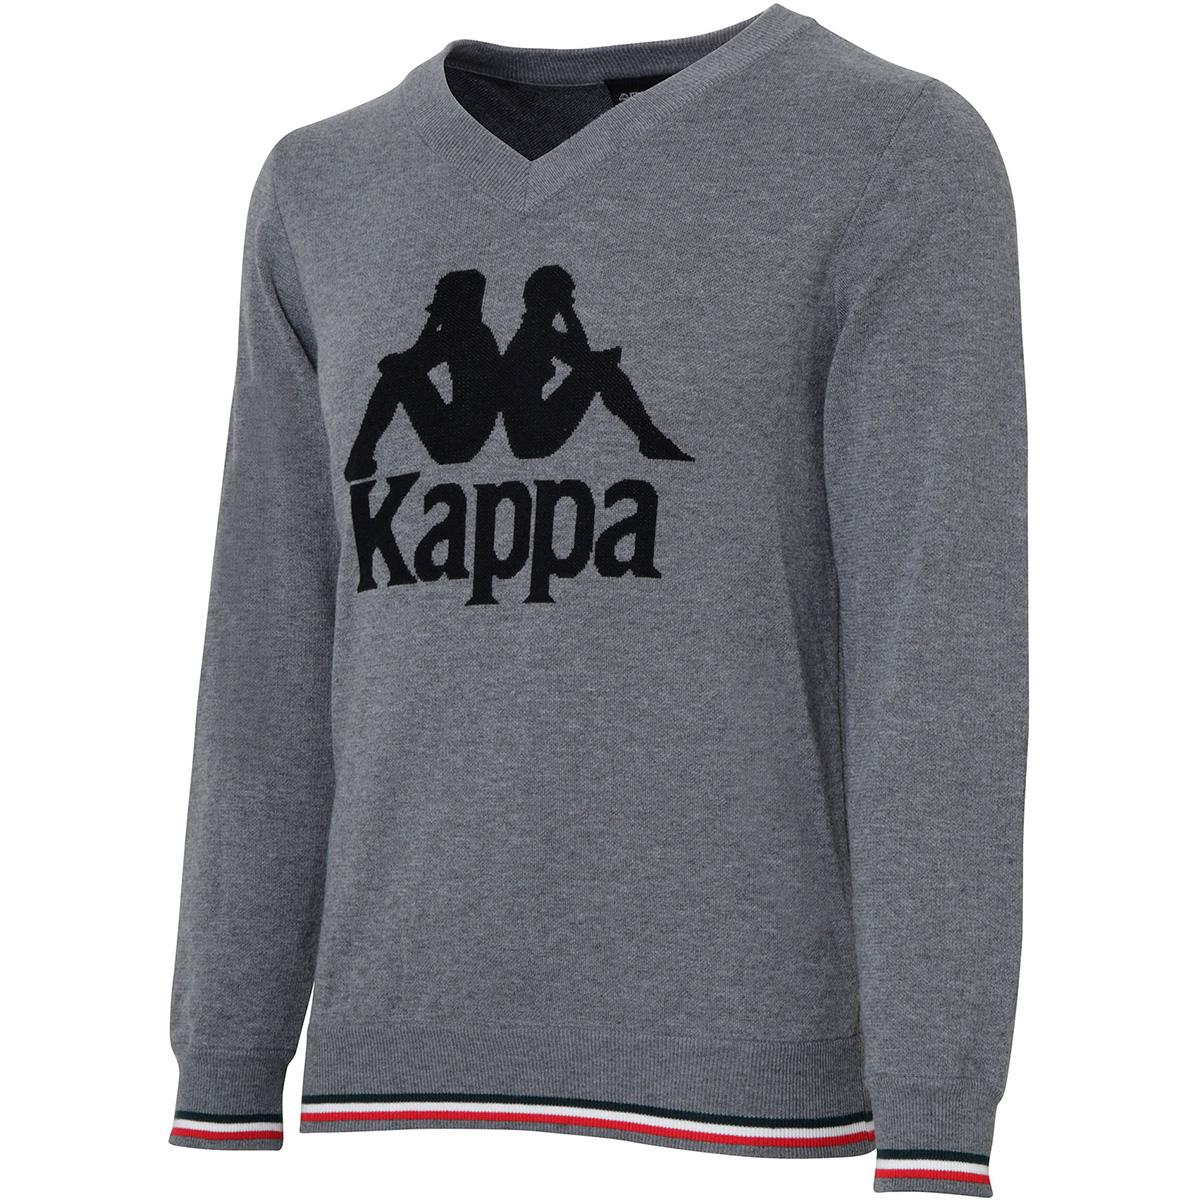 Kappa GOLF BIGオミニVネックセーター